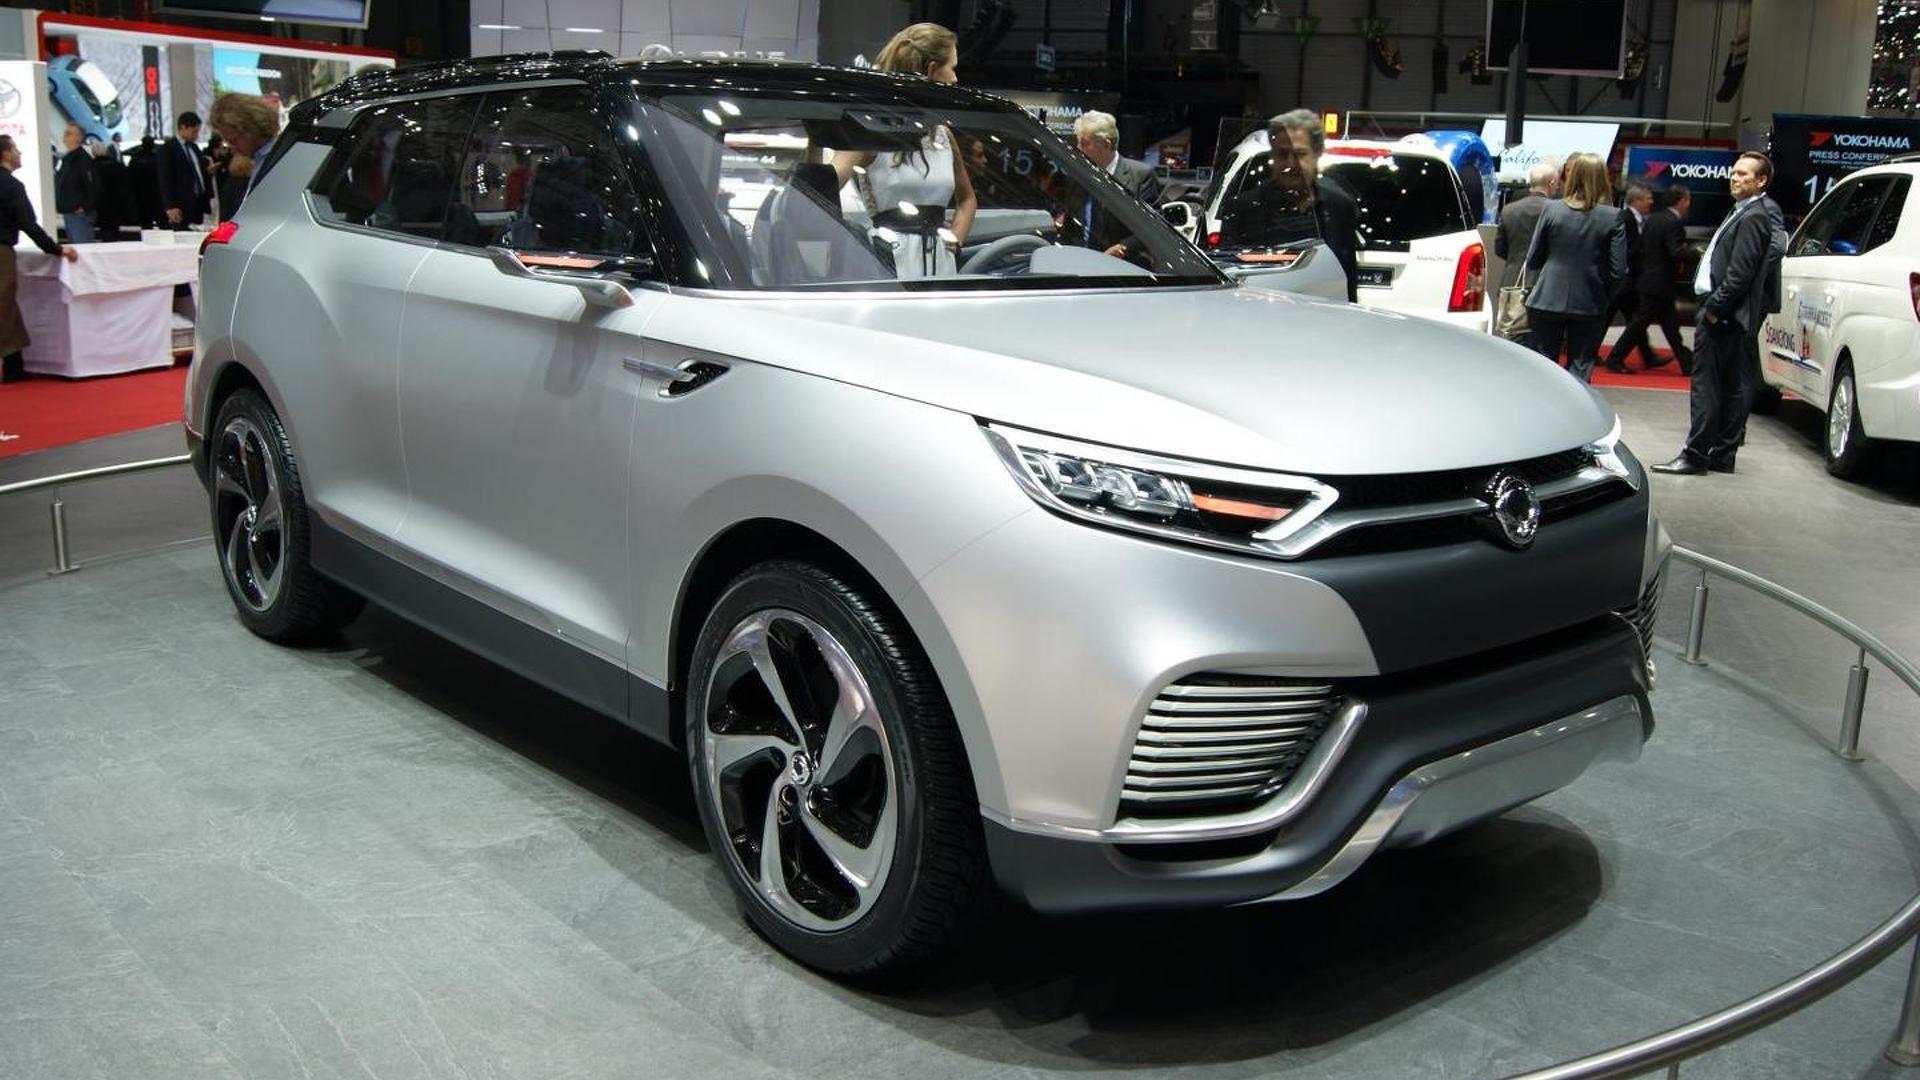 7 Passenger Vehicles >> Ssangyong Xlv To Underpin Future B Segment 7 Passenger Suv